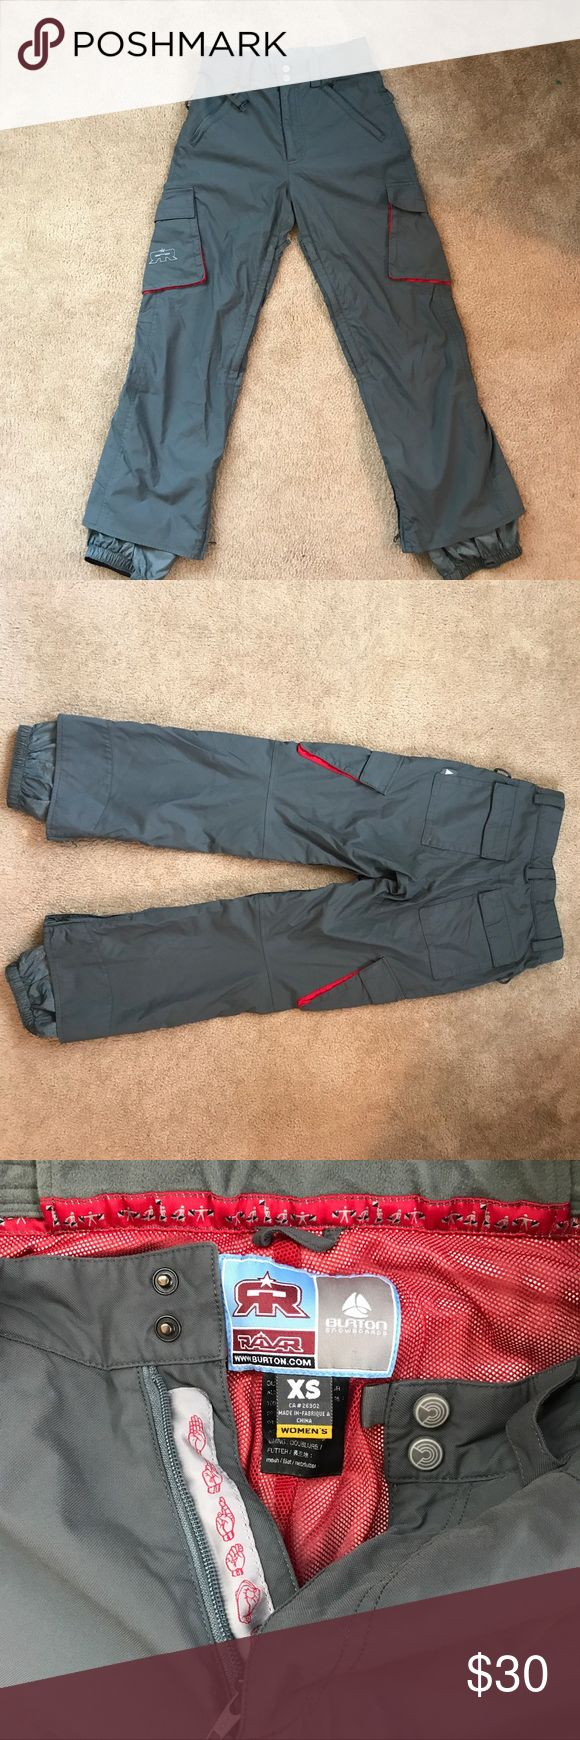 Burton Radar Snowboarding Pants - Grey Size XS Burton Radar Snowboarding Pants - Grey Size XS Small Scuff on back pocket not ripped. Pictured * Burton Pants